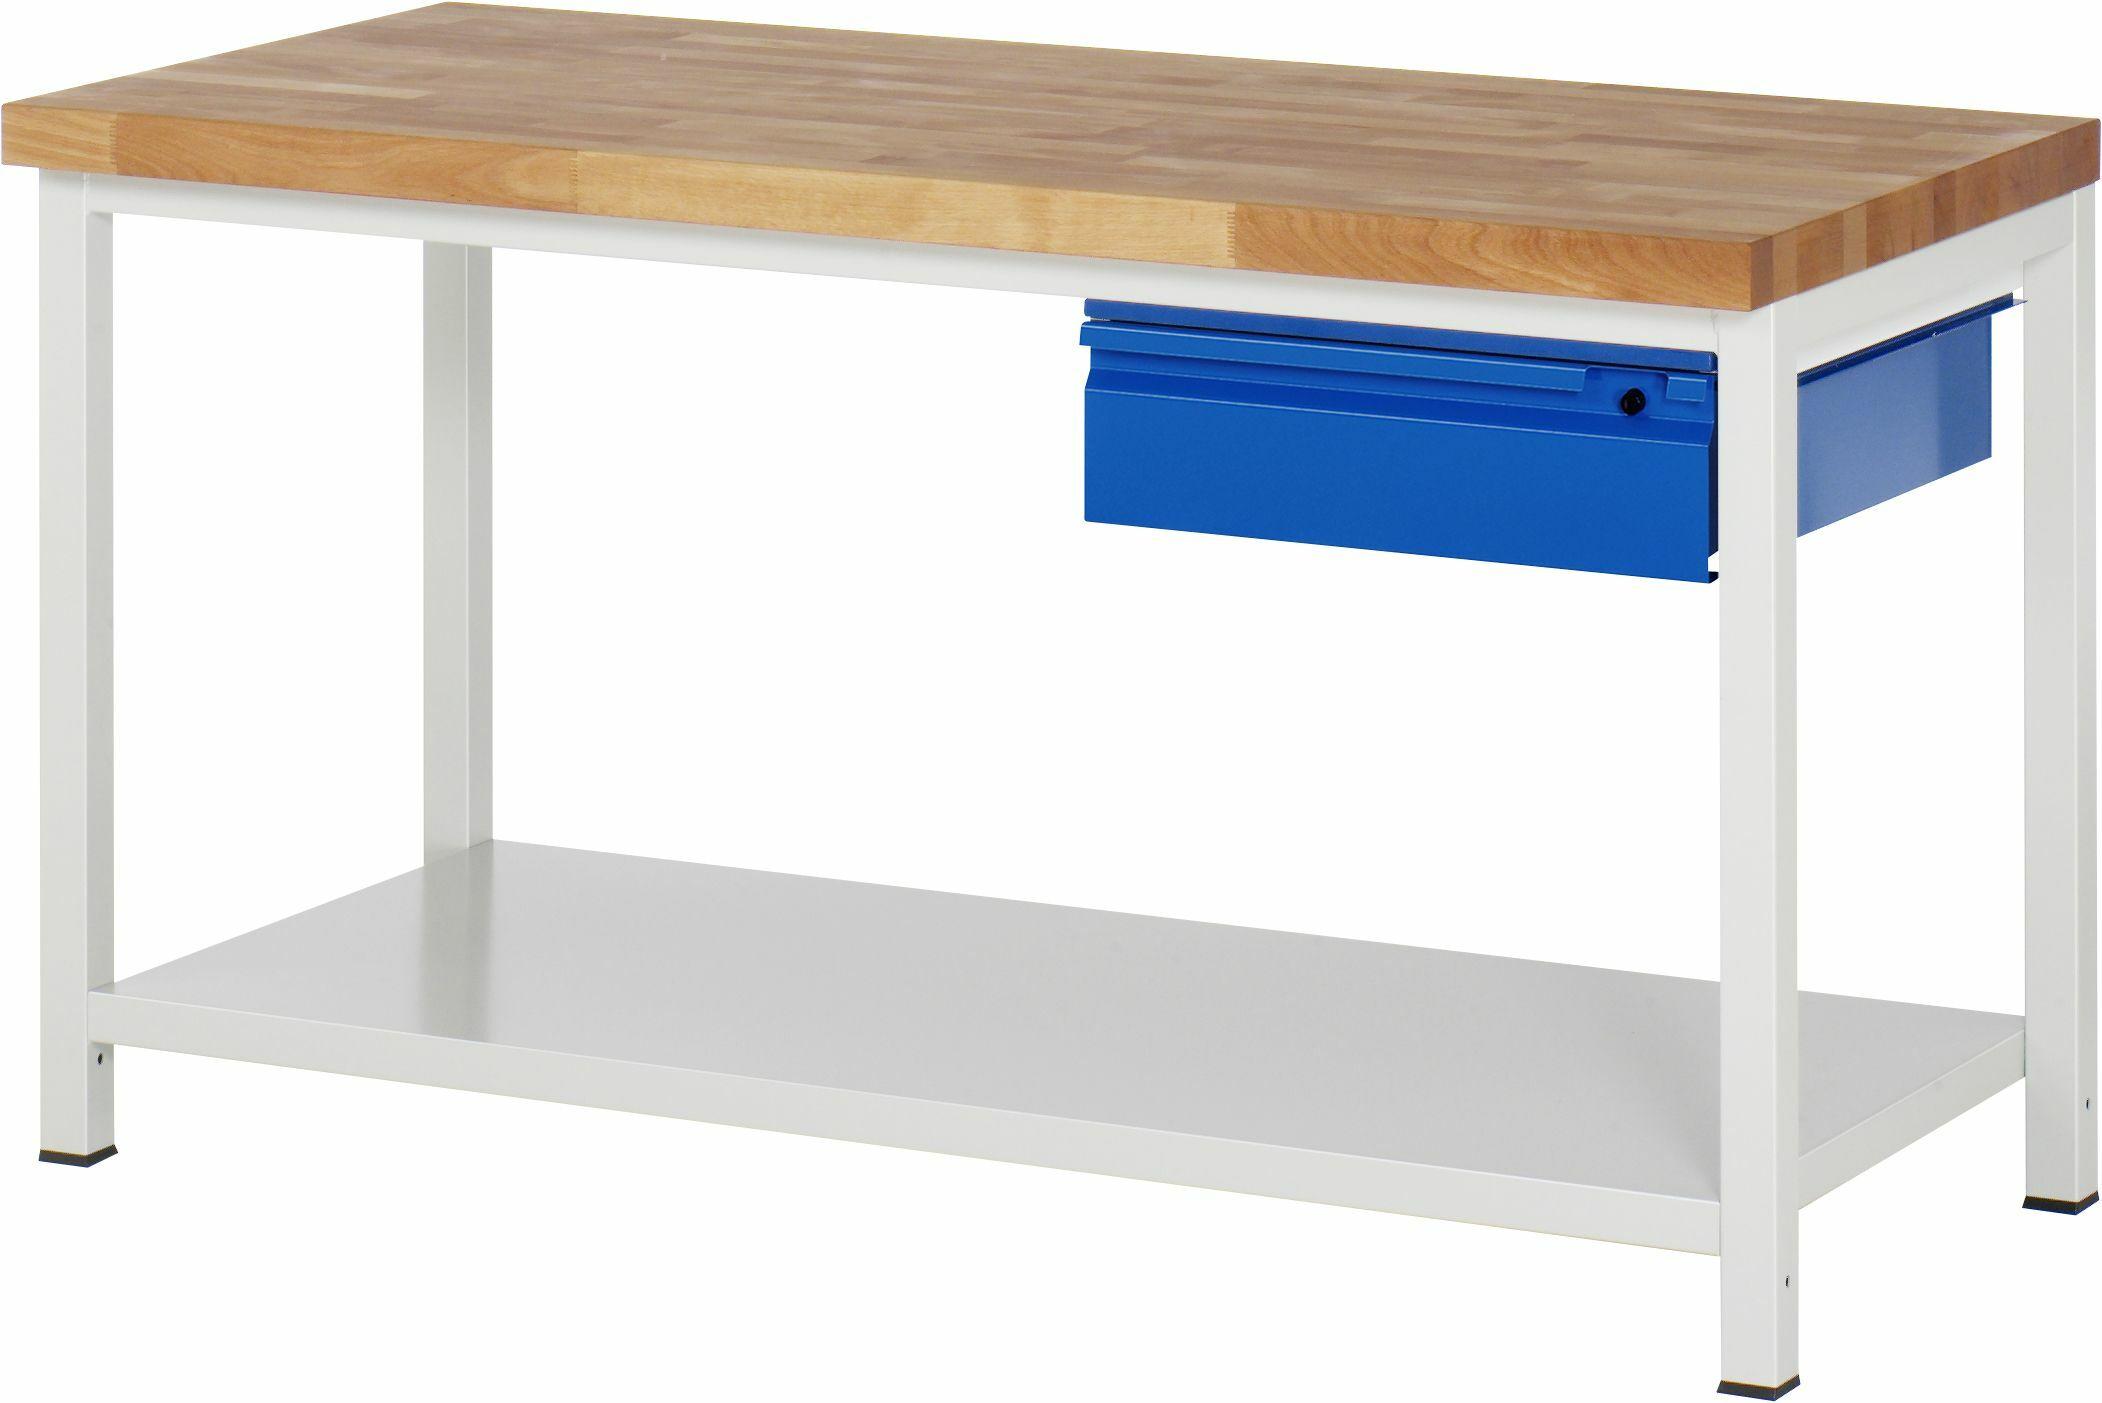 werkbank stahlblech ablageboden t650mm fachh he 620mm 1 h ngeschublade 150 mm online kaufen. Black Bedroom Furniture Sets. Home Design Ideas